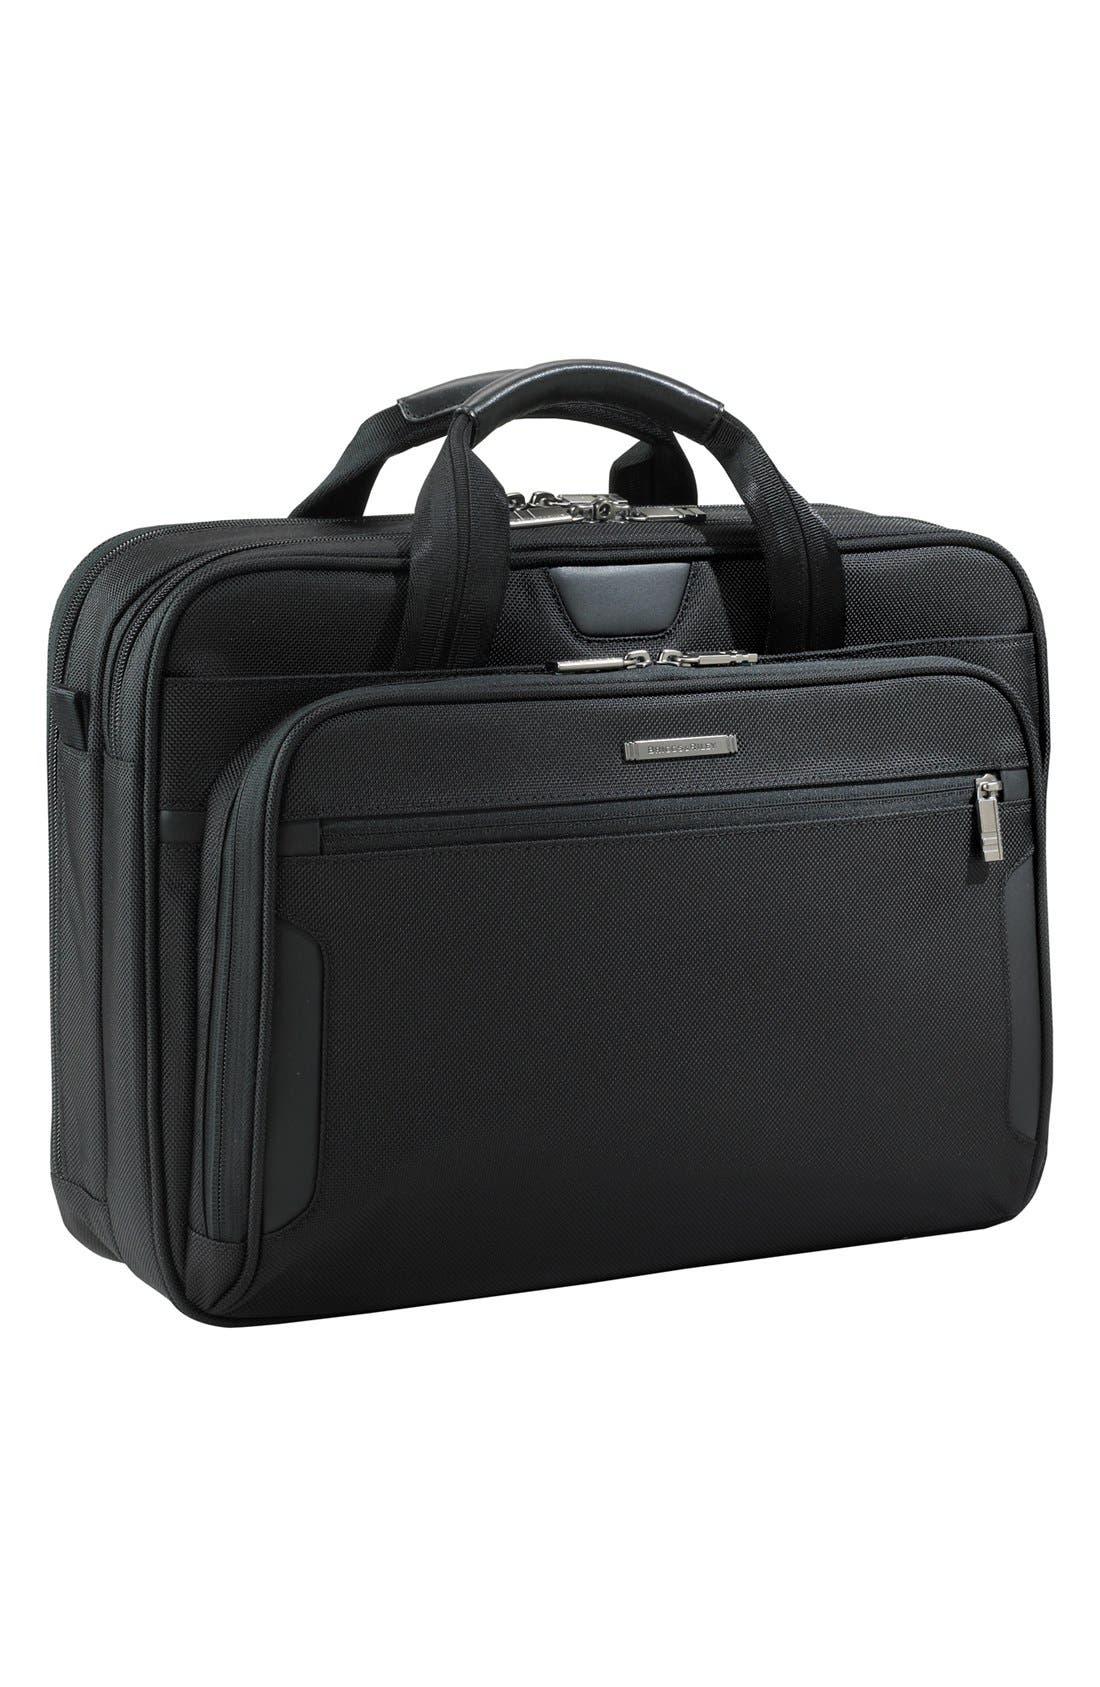 Alternate Image 1 Selected - Briggs & Riley 'Medium' Ballistic Nylon Briefcase